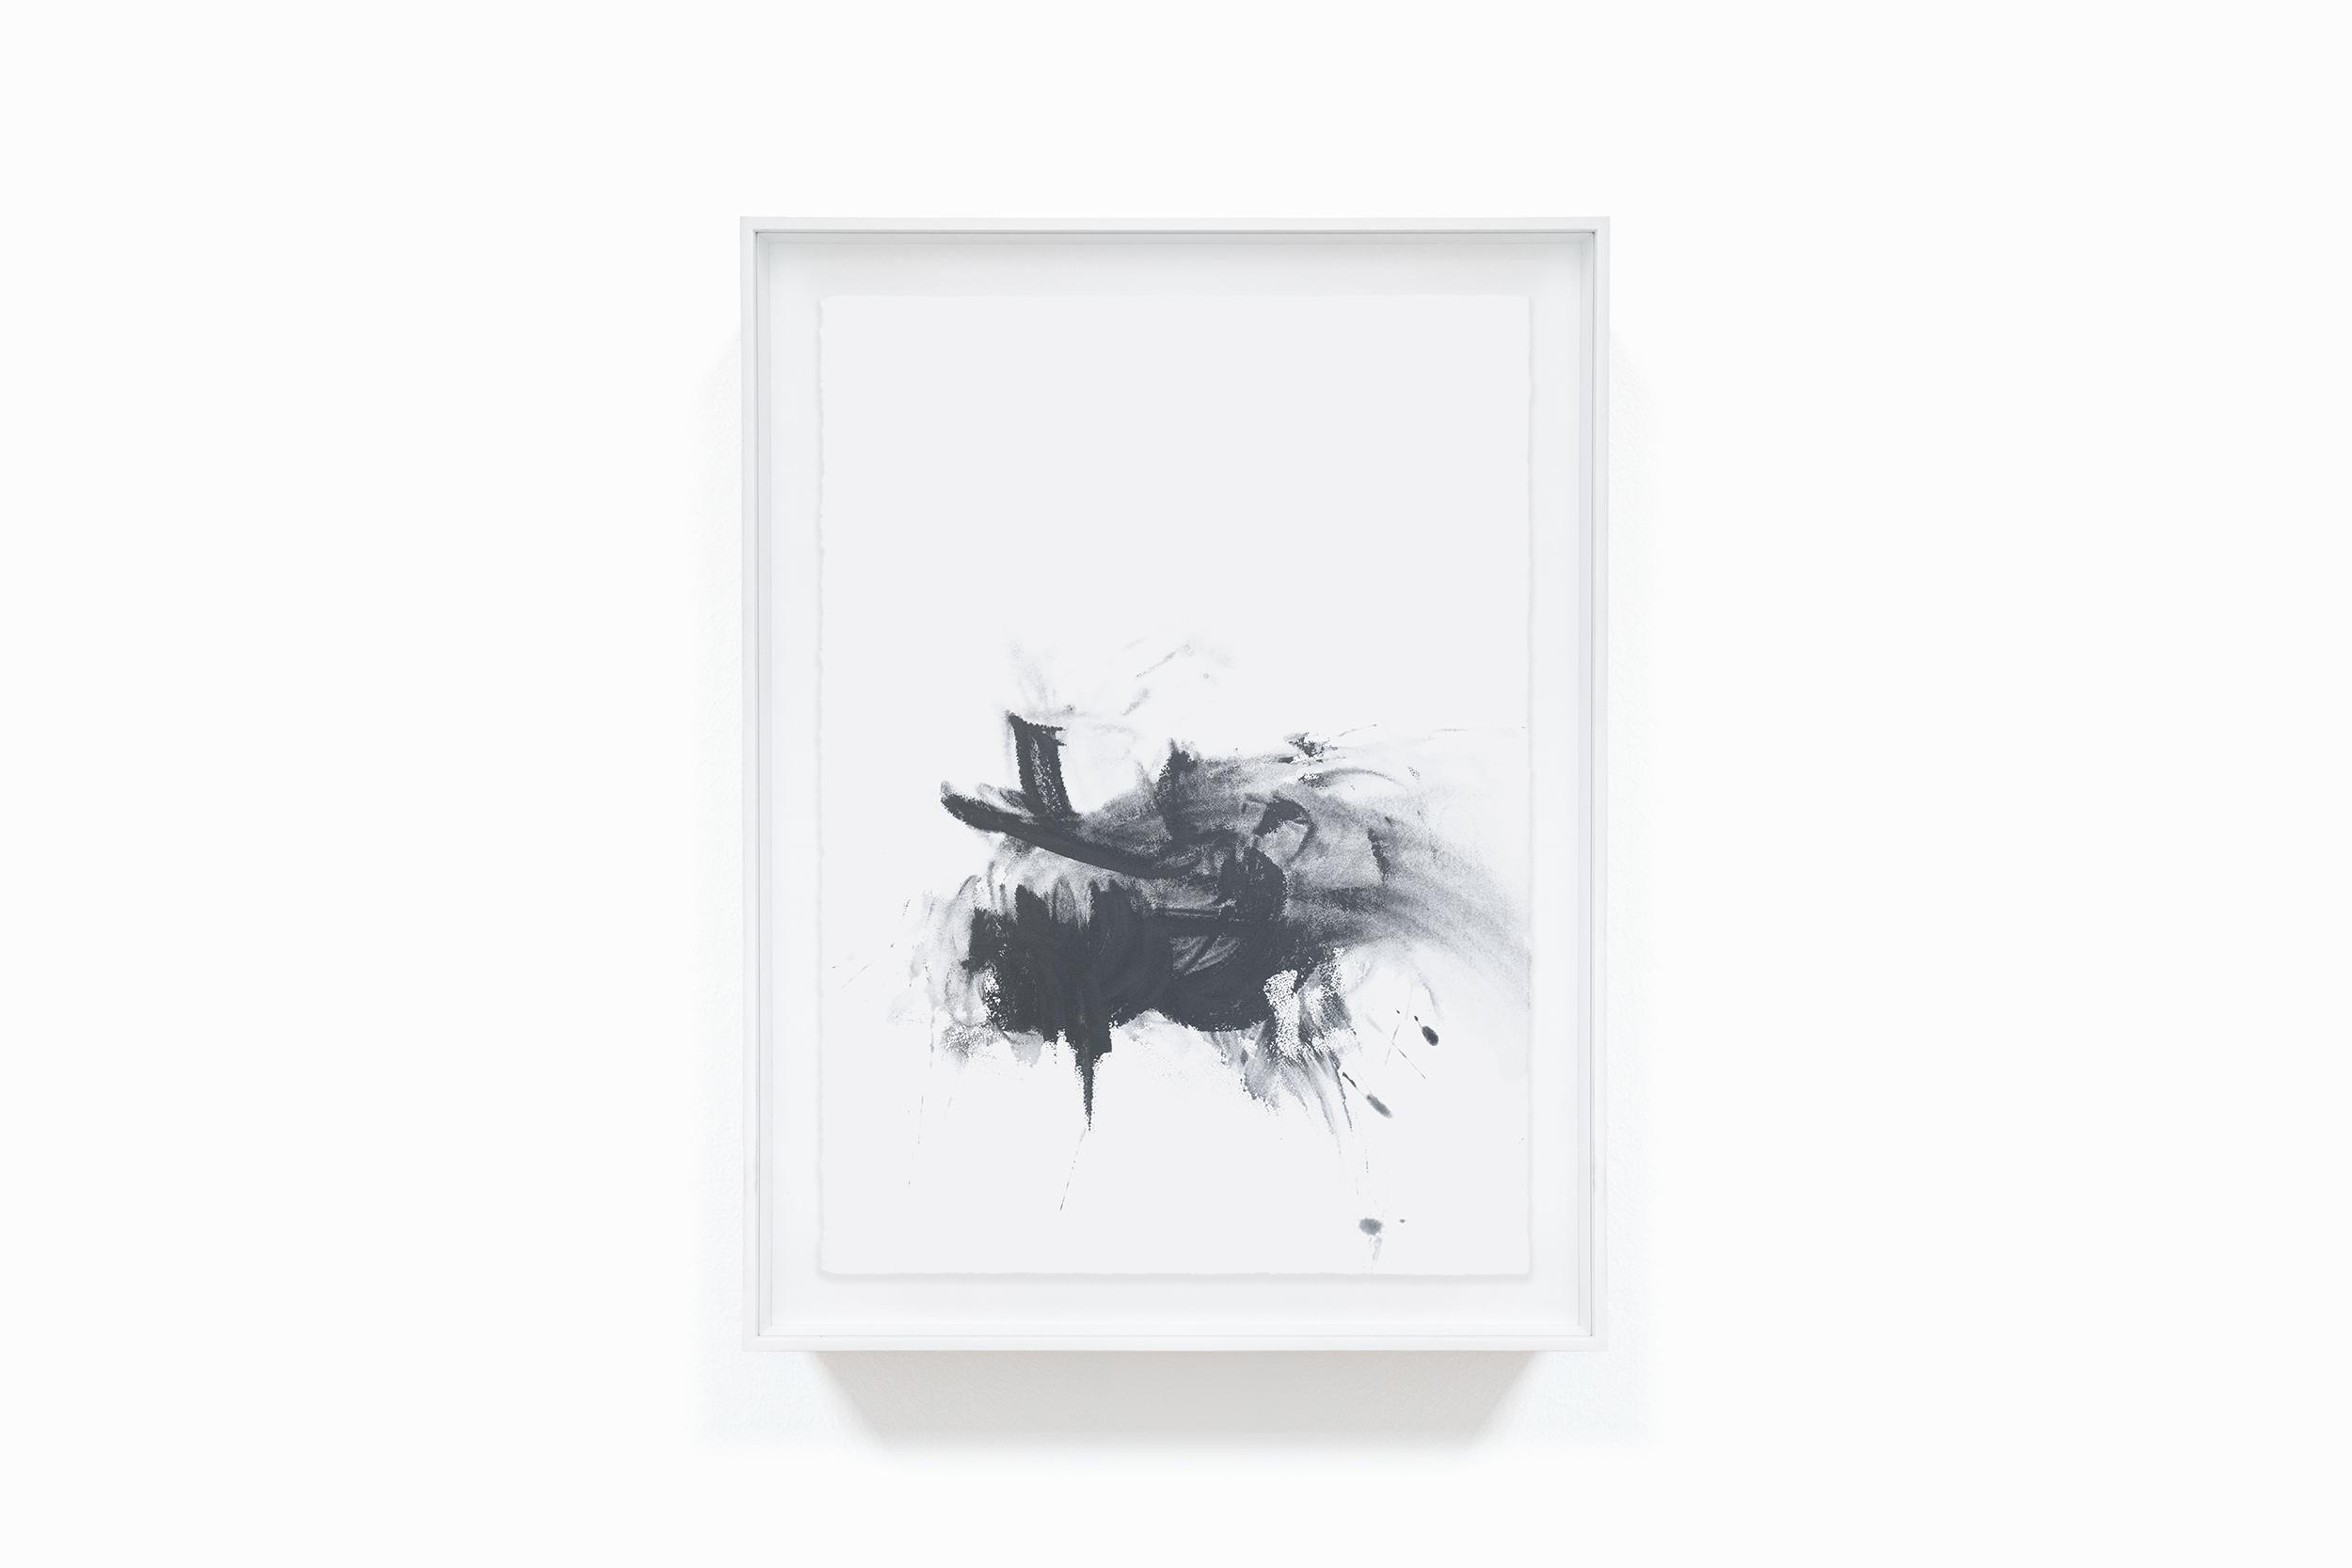 100 Andre Gigante Pintura Painting bonjourmolotov La.jpg